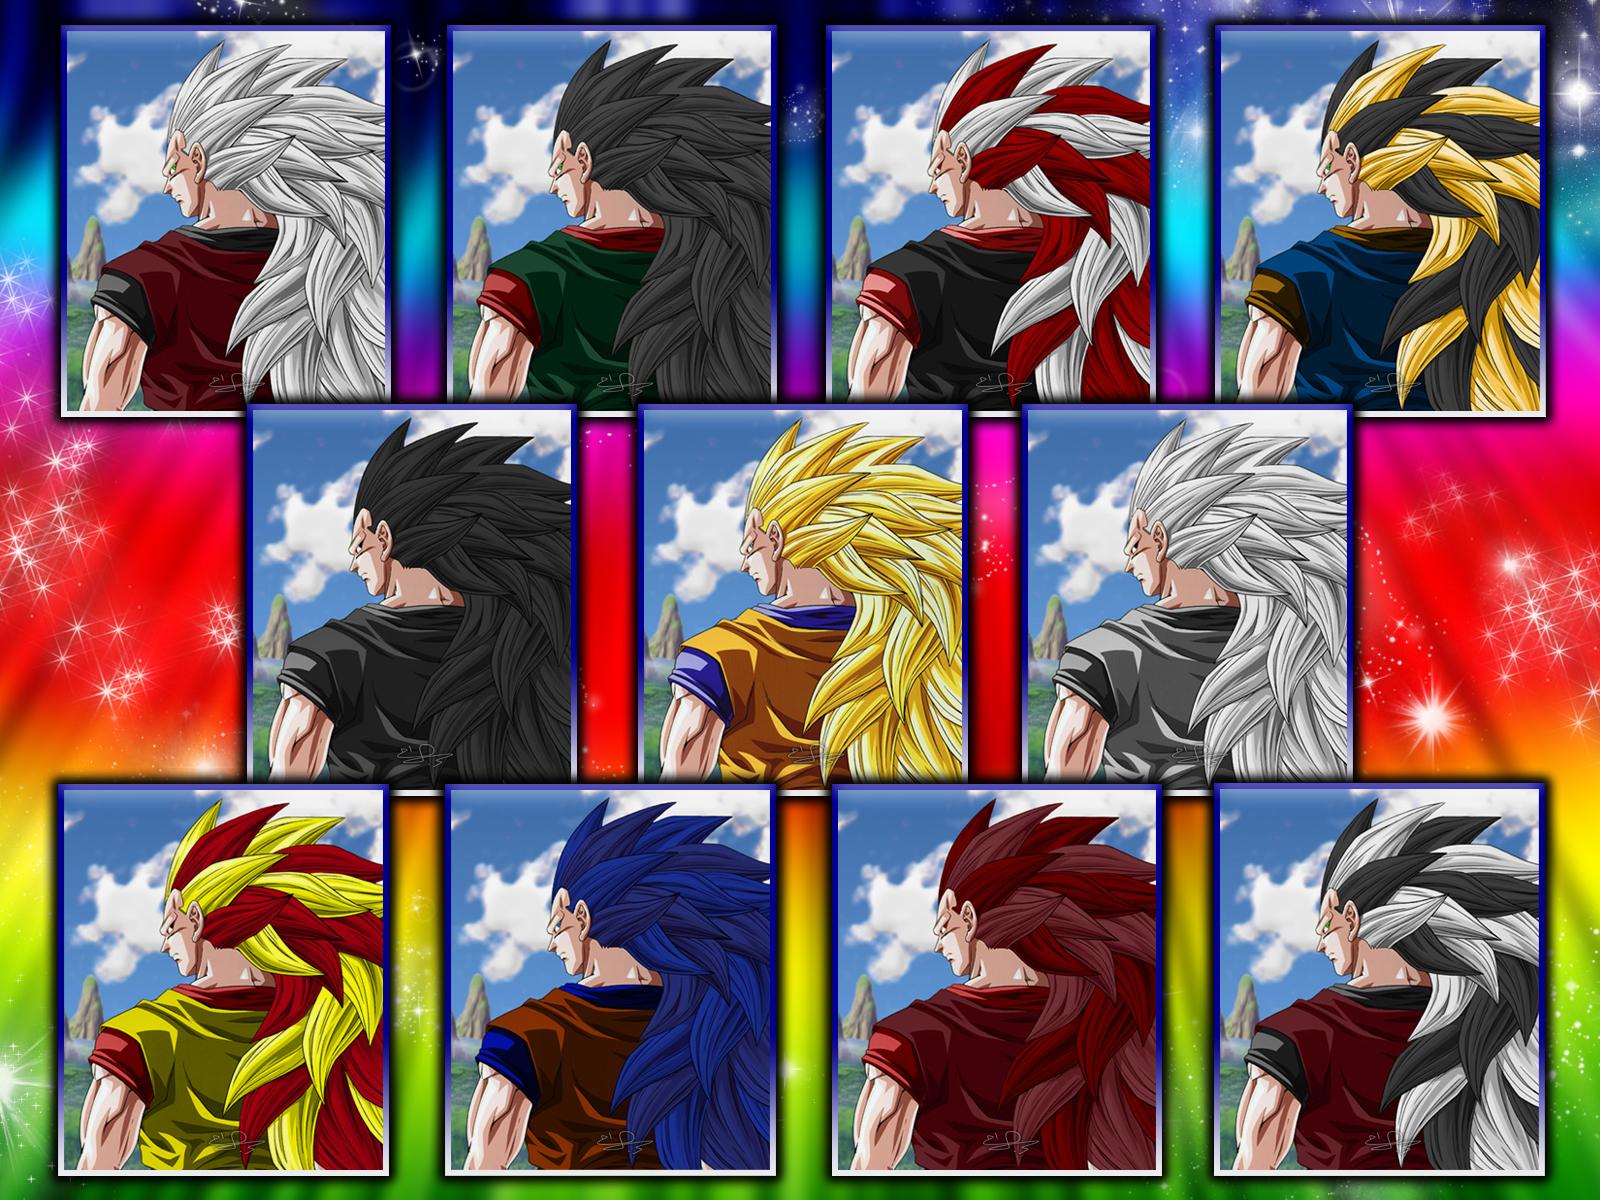 Super Saiyan Live Wallpaper Iphone X Dragon Ball Z Wallpapers Colorful Hd Desktop Wallpapers